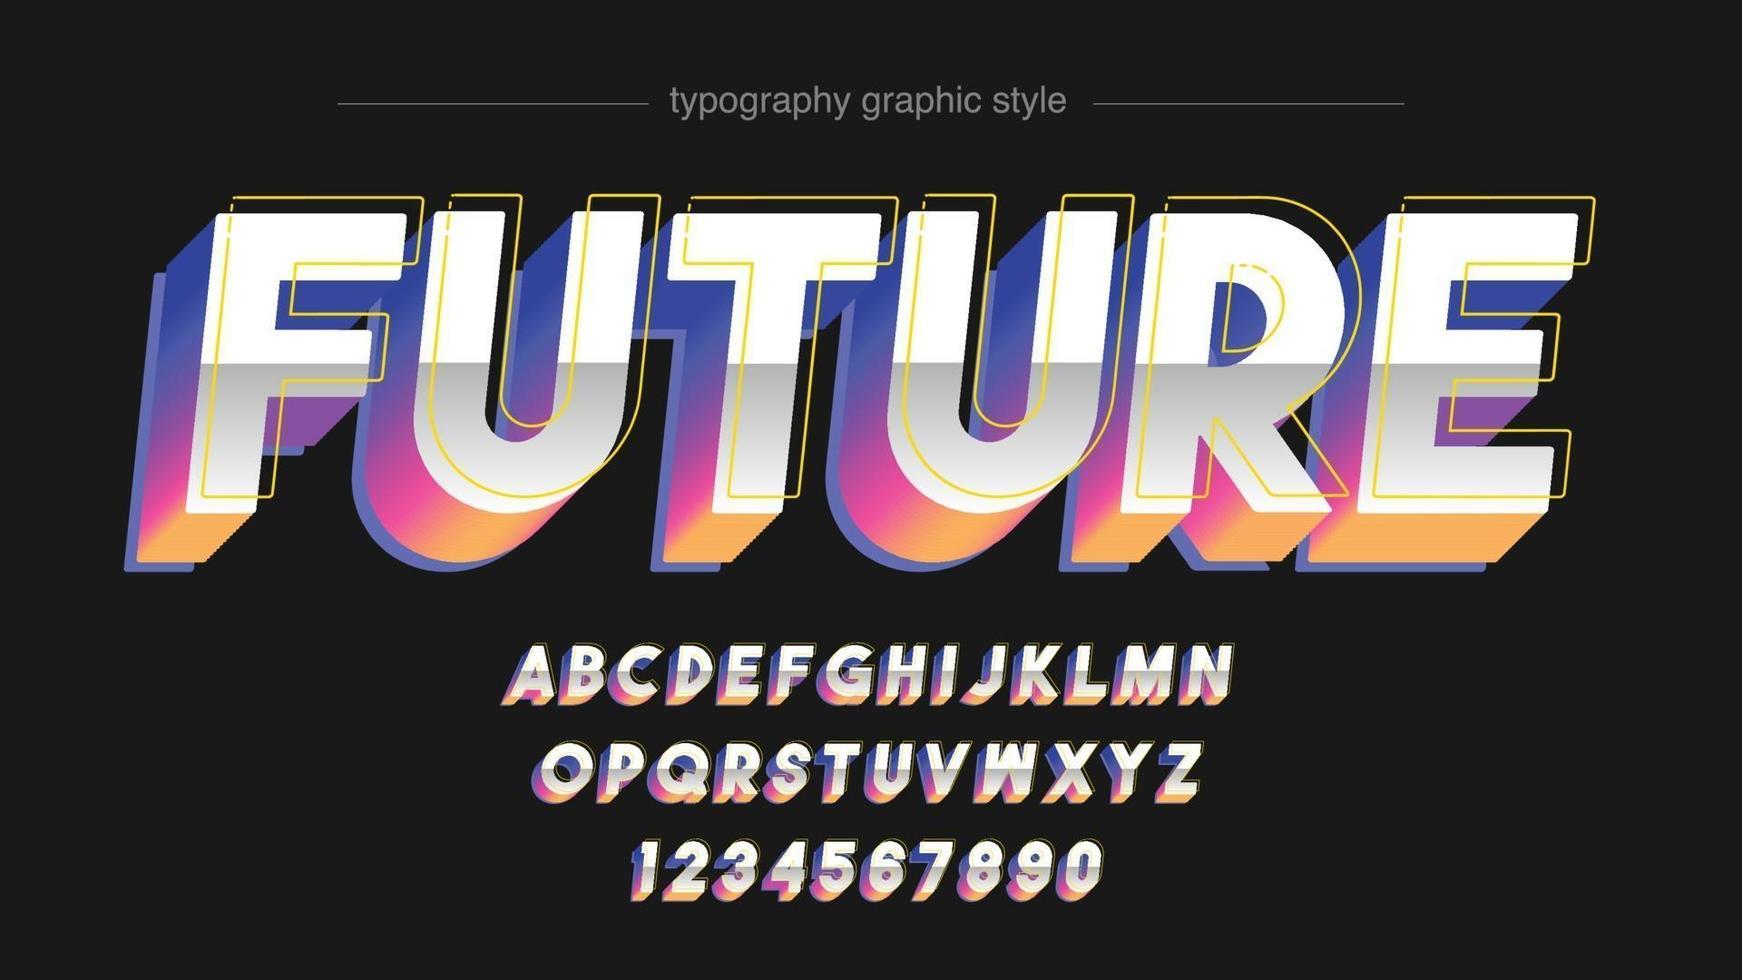 tipografia futurista colorida cromada vetor